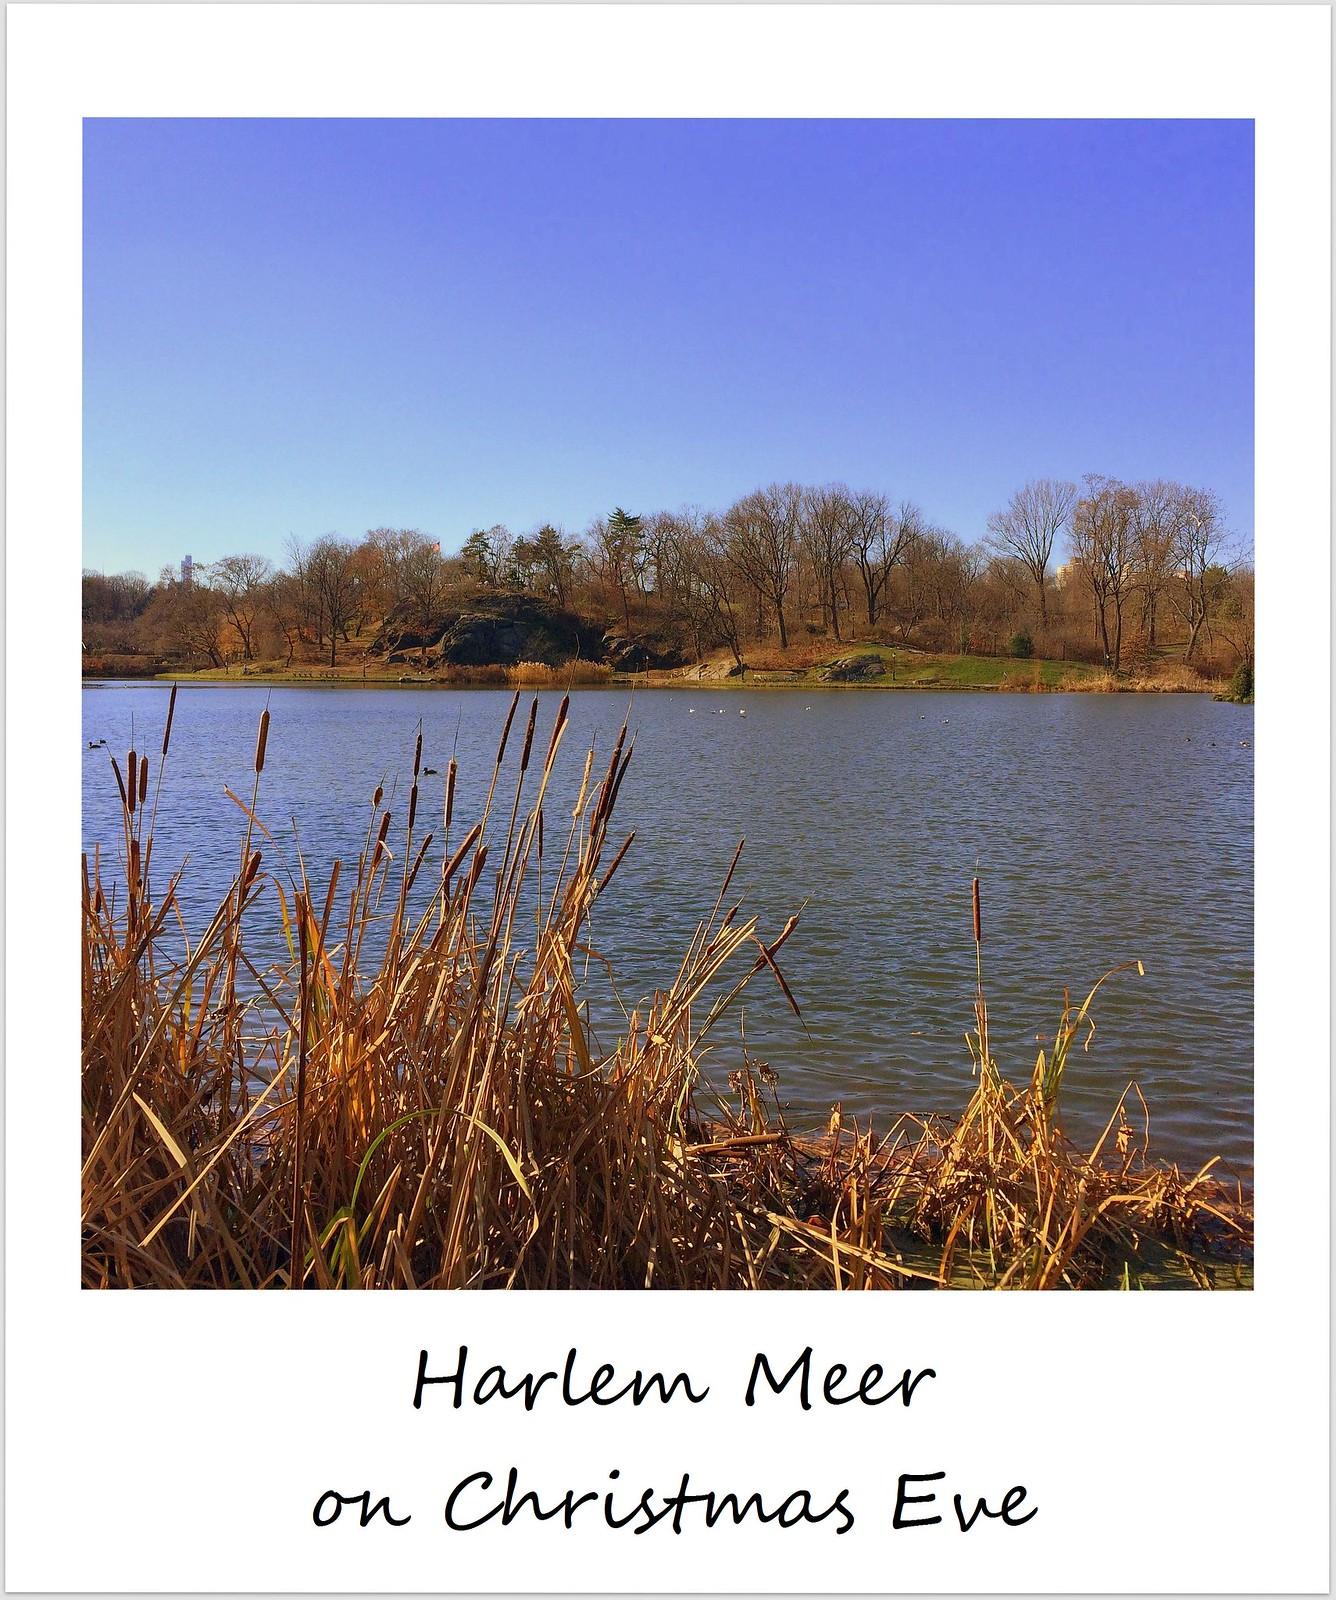 polaroid usa new york city central park harlem meer